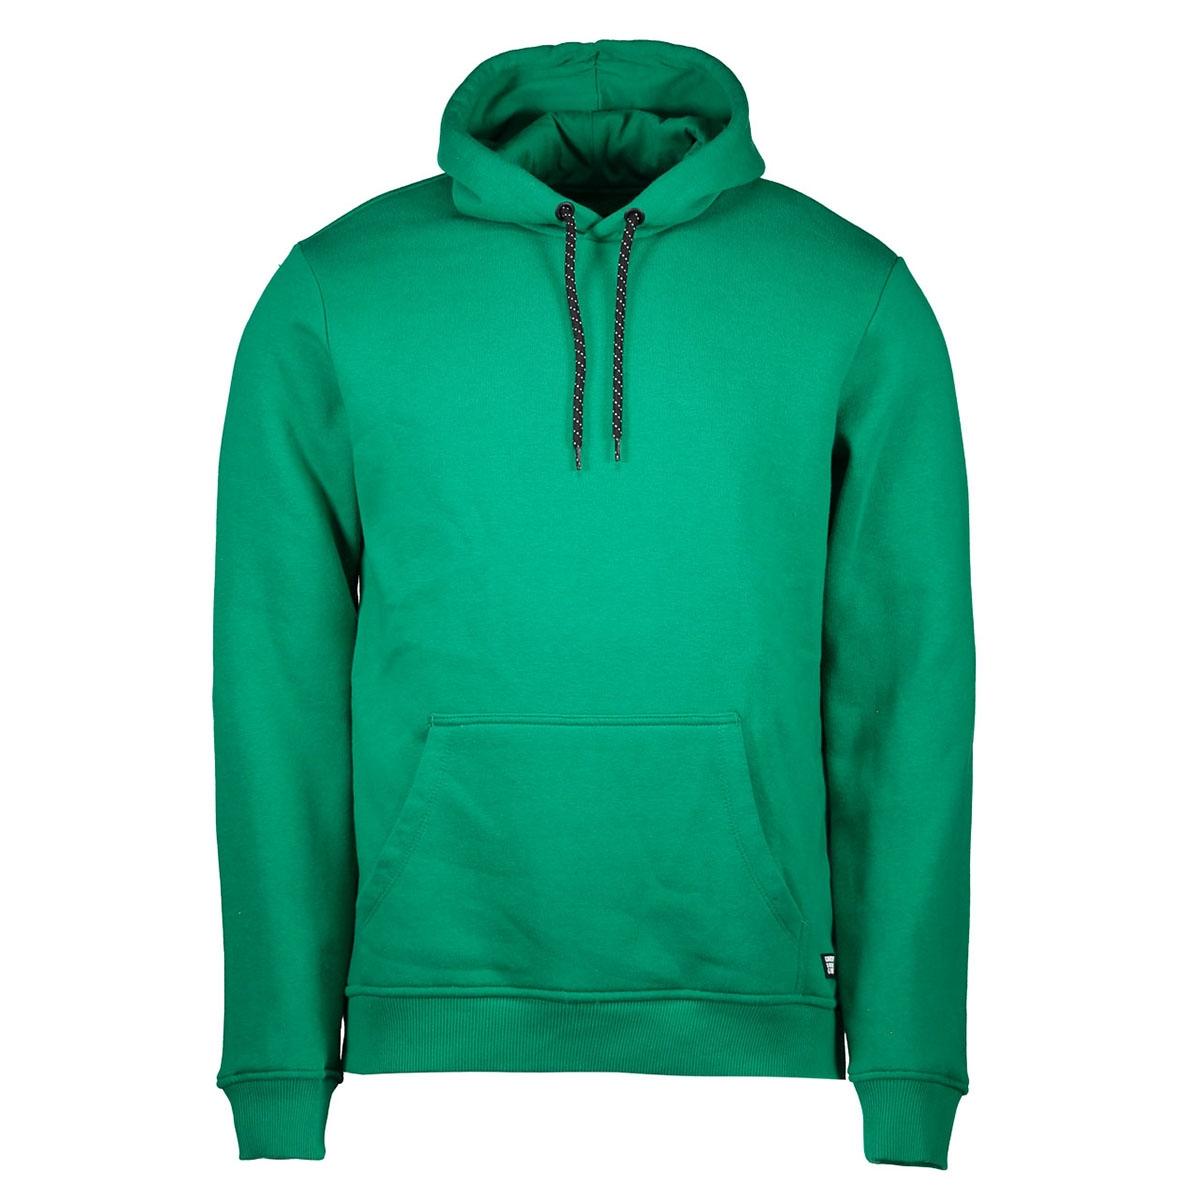 kimar hood sw 40379 cars sweater 55 green